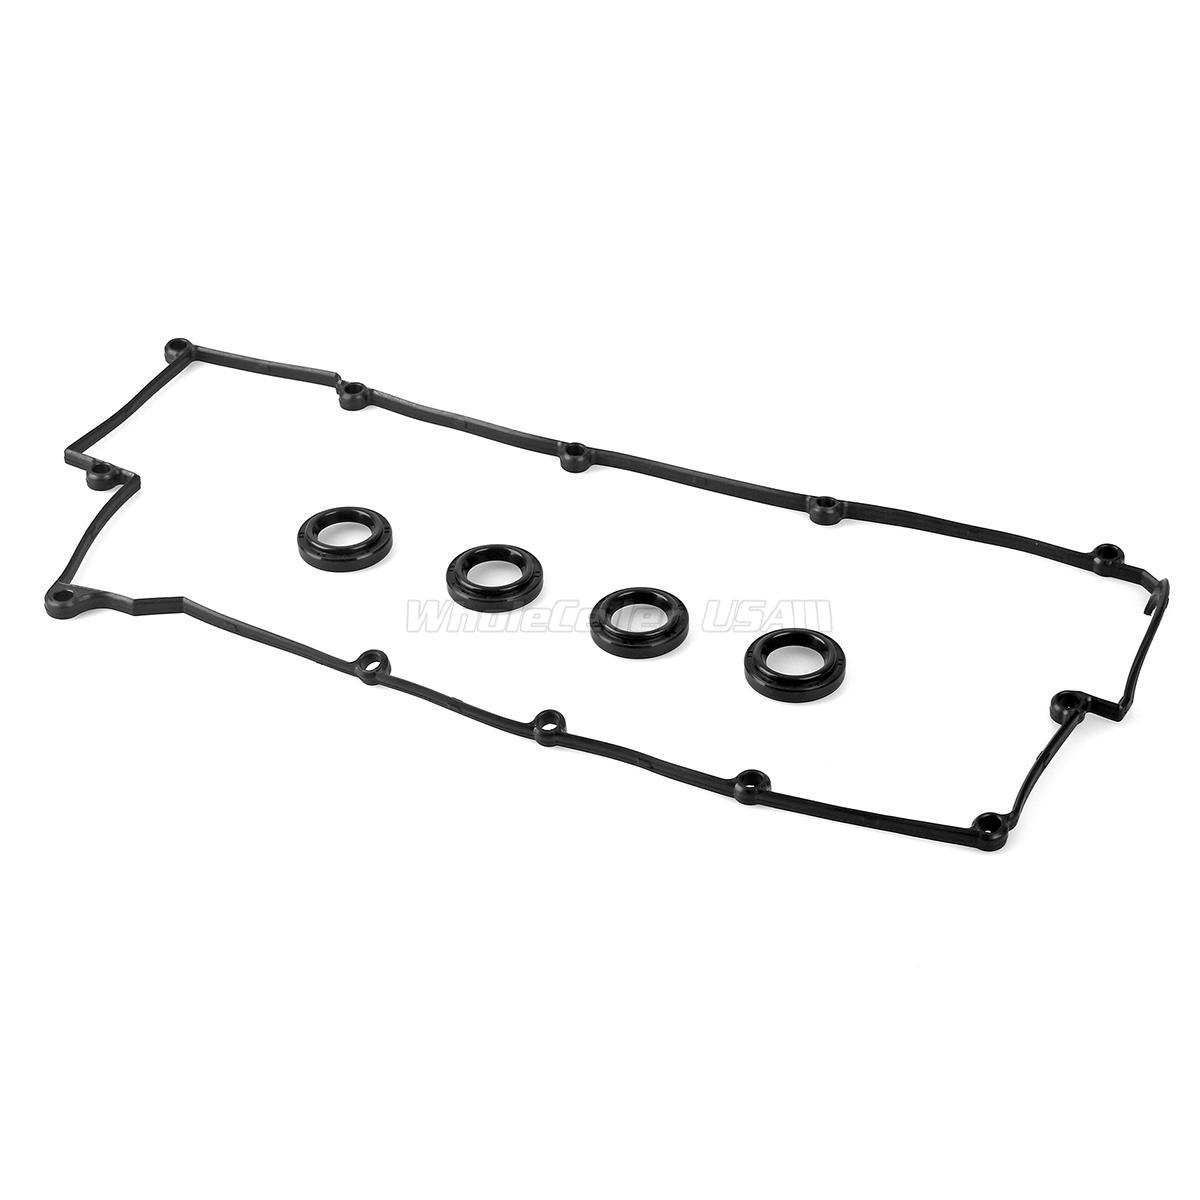 Cylinder Valve Cover Gasket Set For 03 12 Hyundai Tiburon